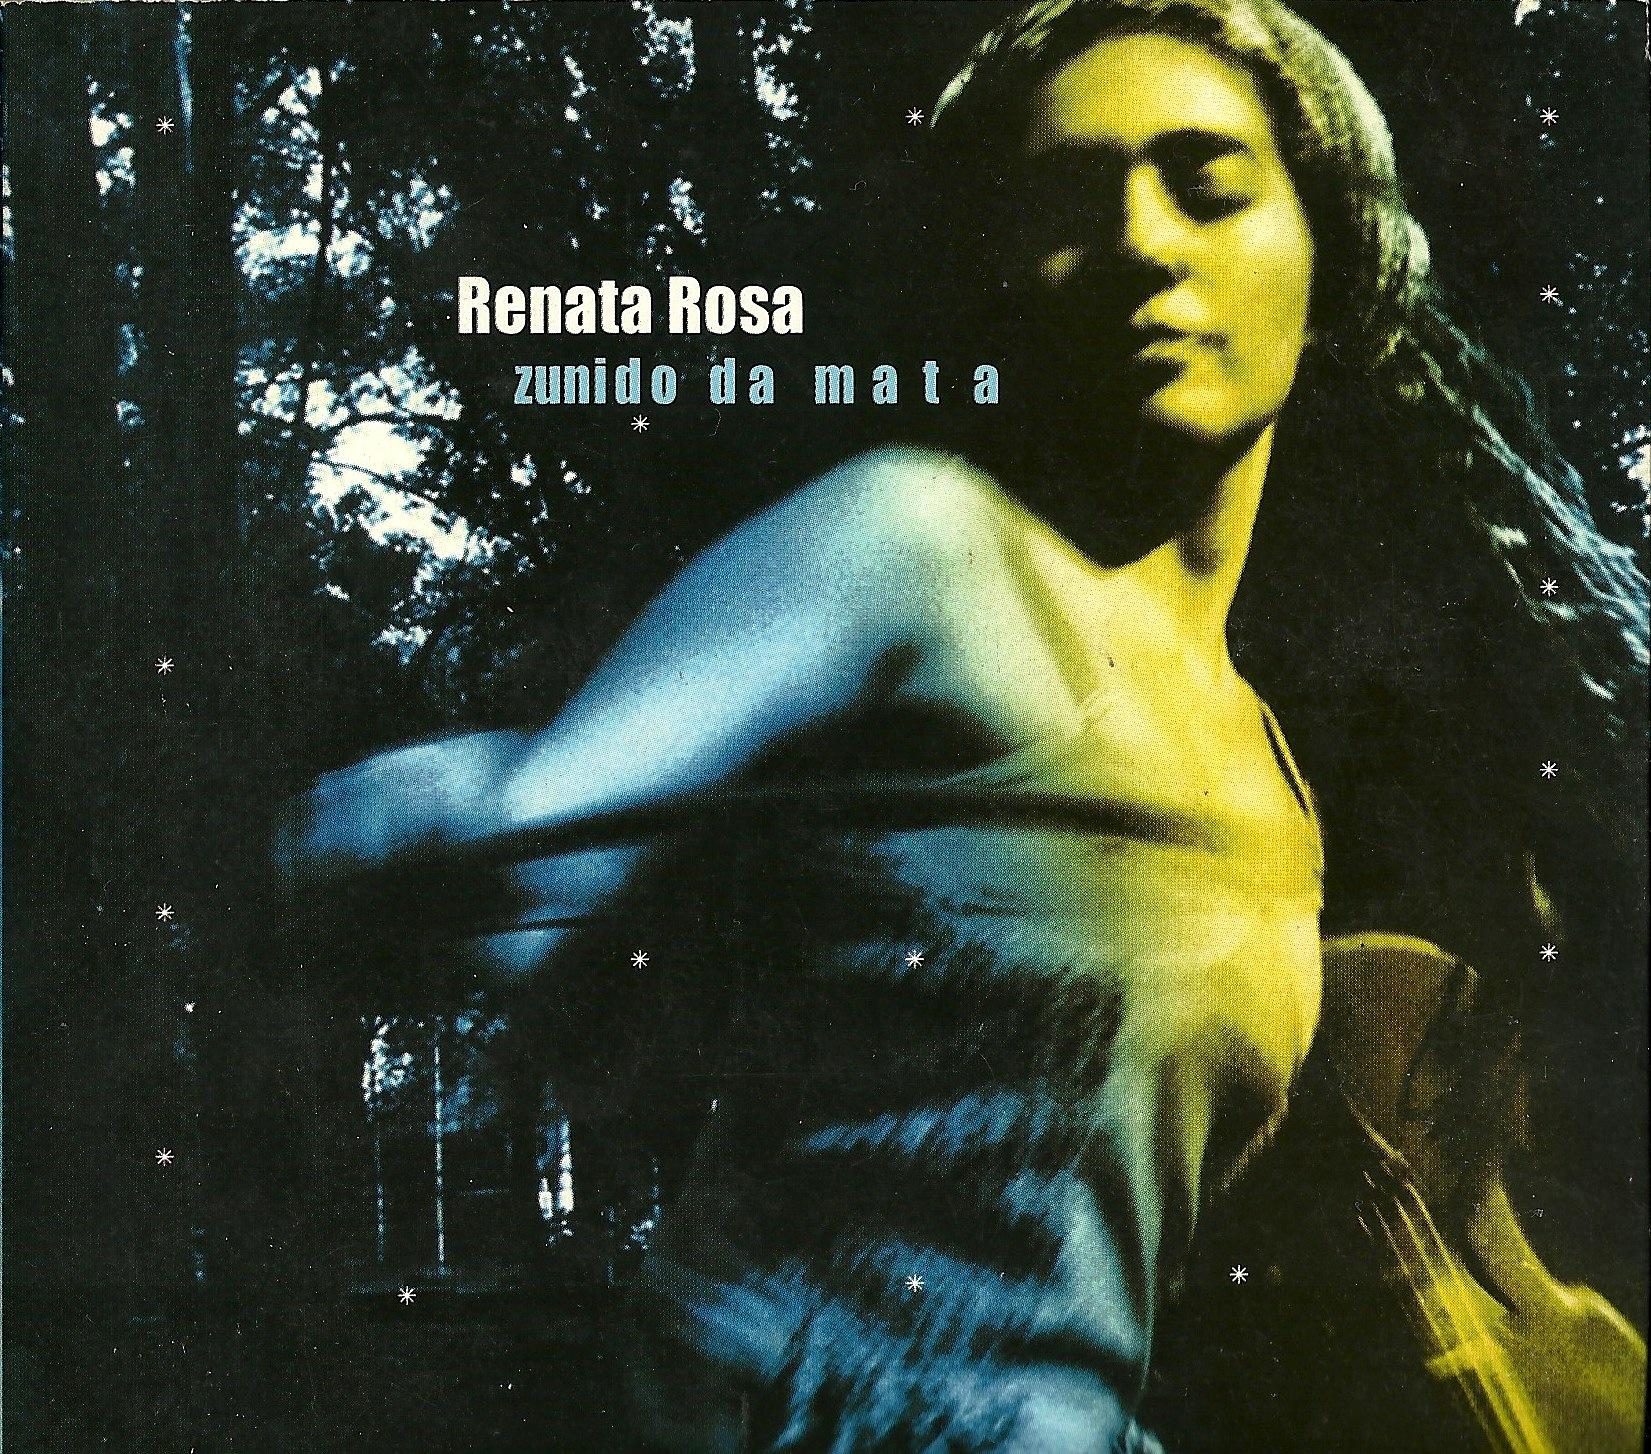 33 2002 Zunido da Mata - Renata Rosa.jpg